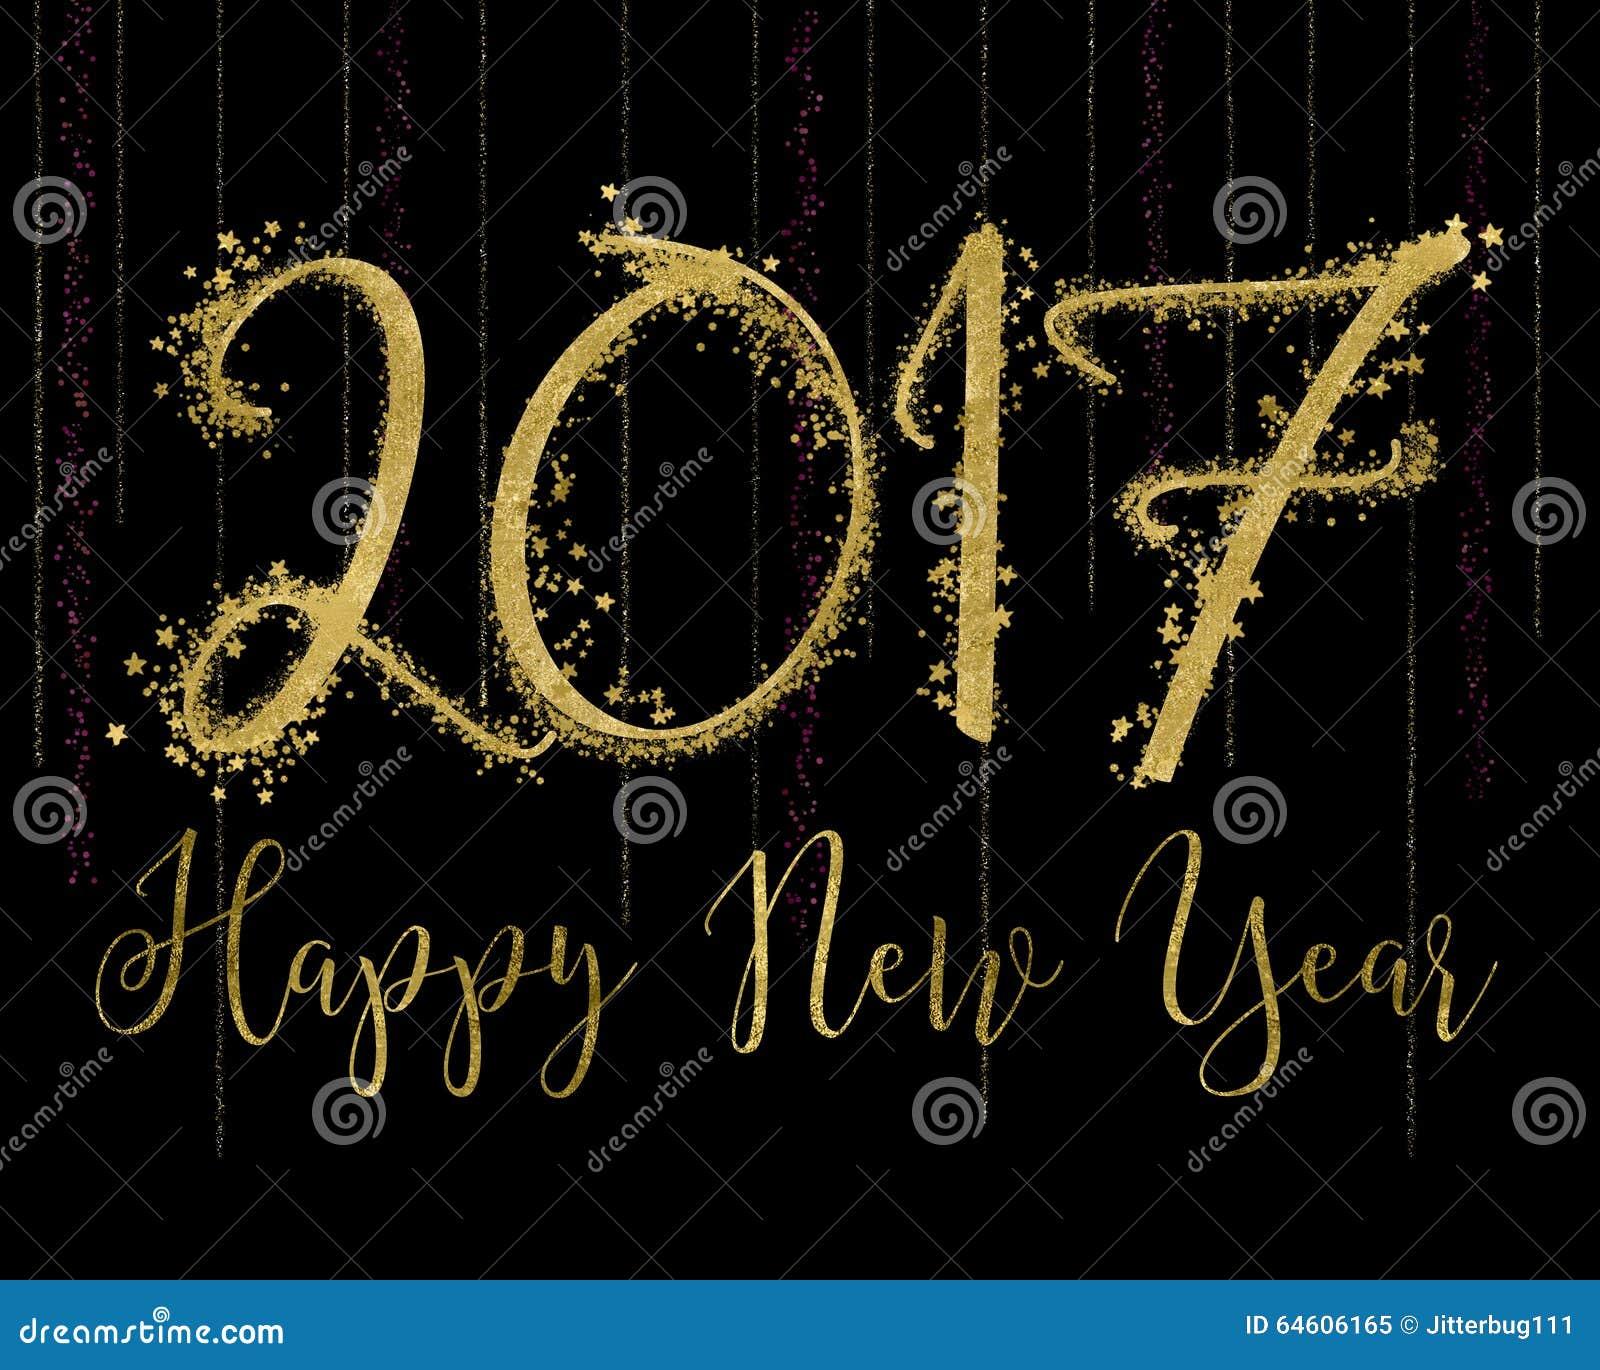 2017 Happy New Year Stock Illustration - Image: 64606165